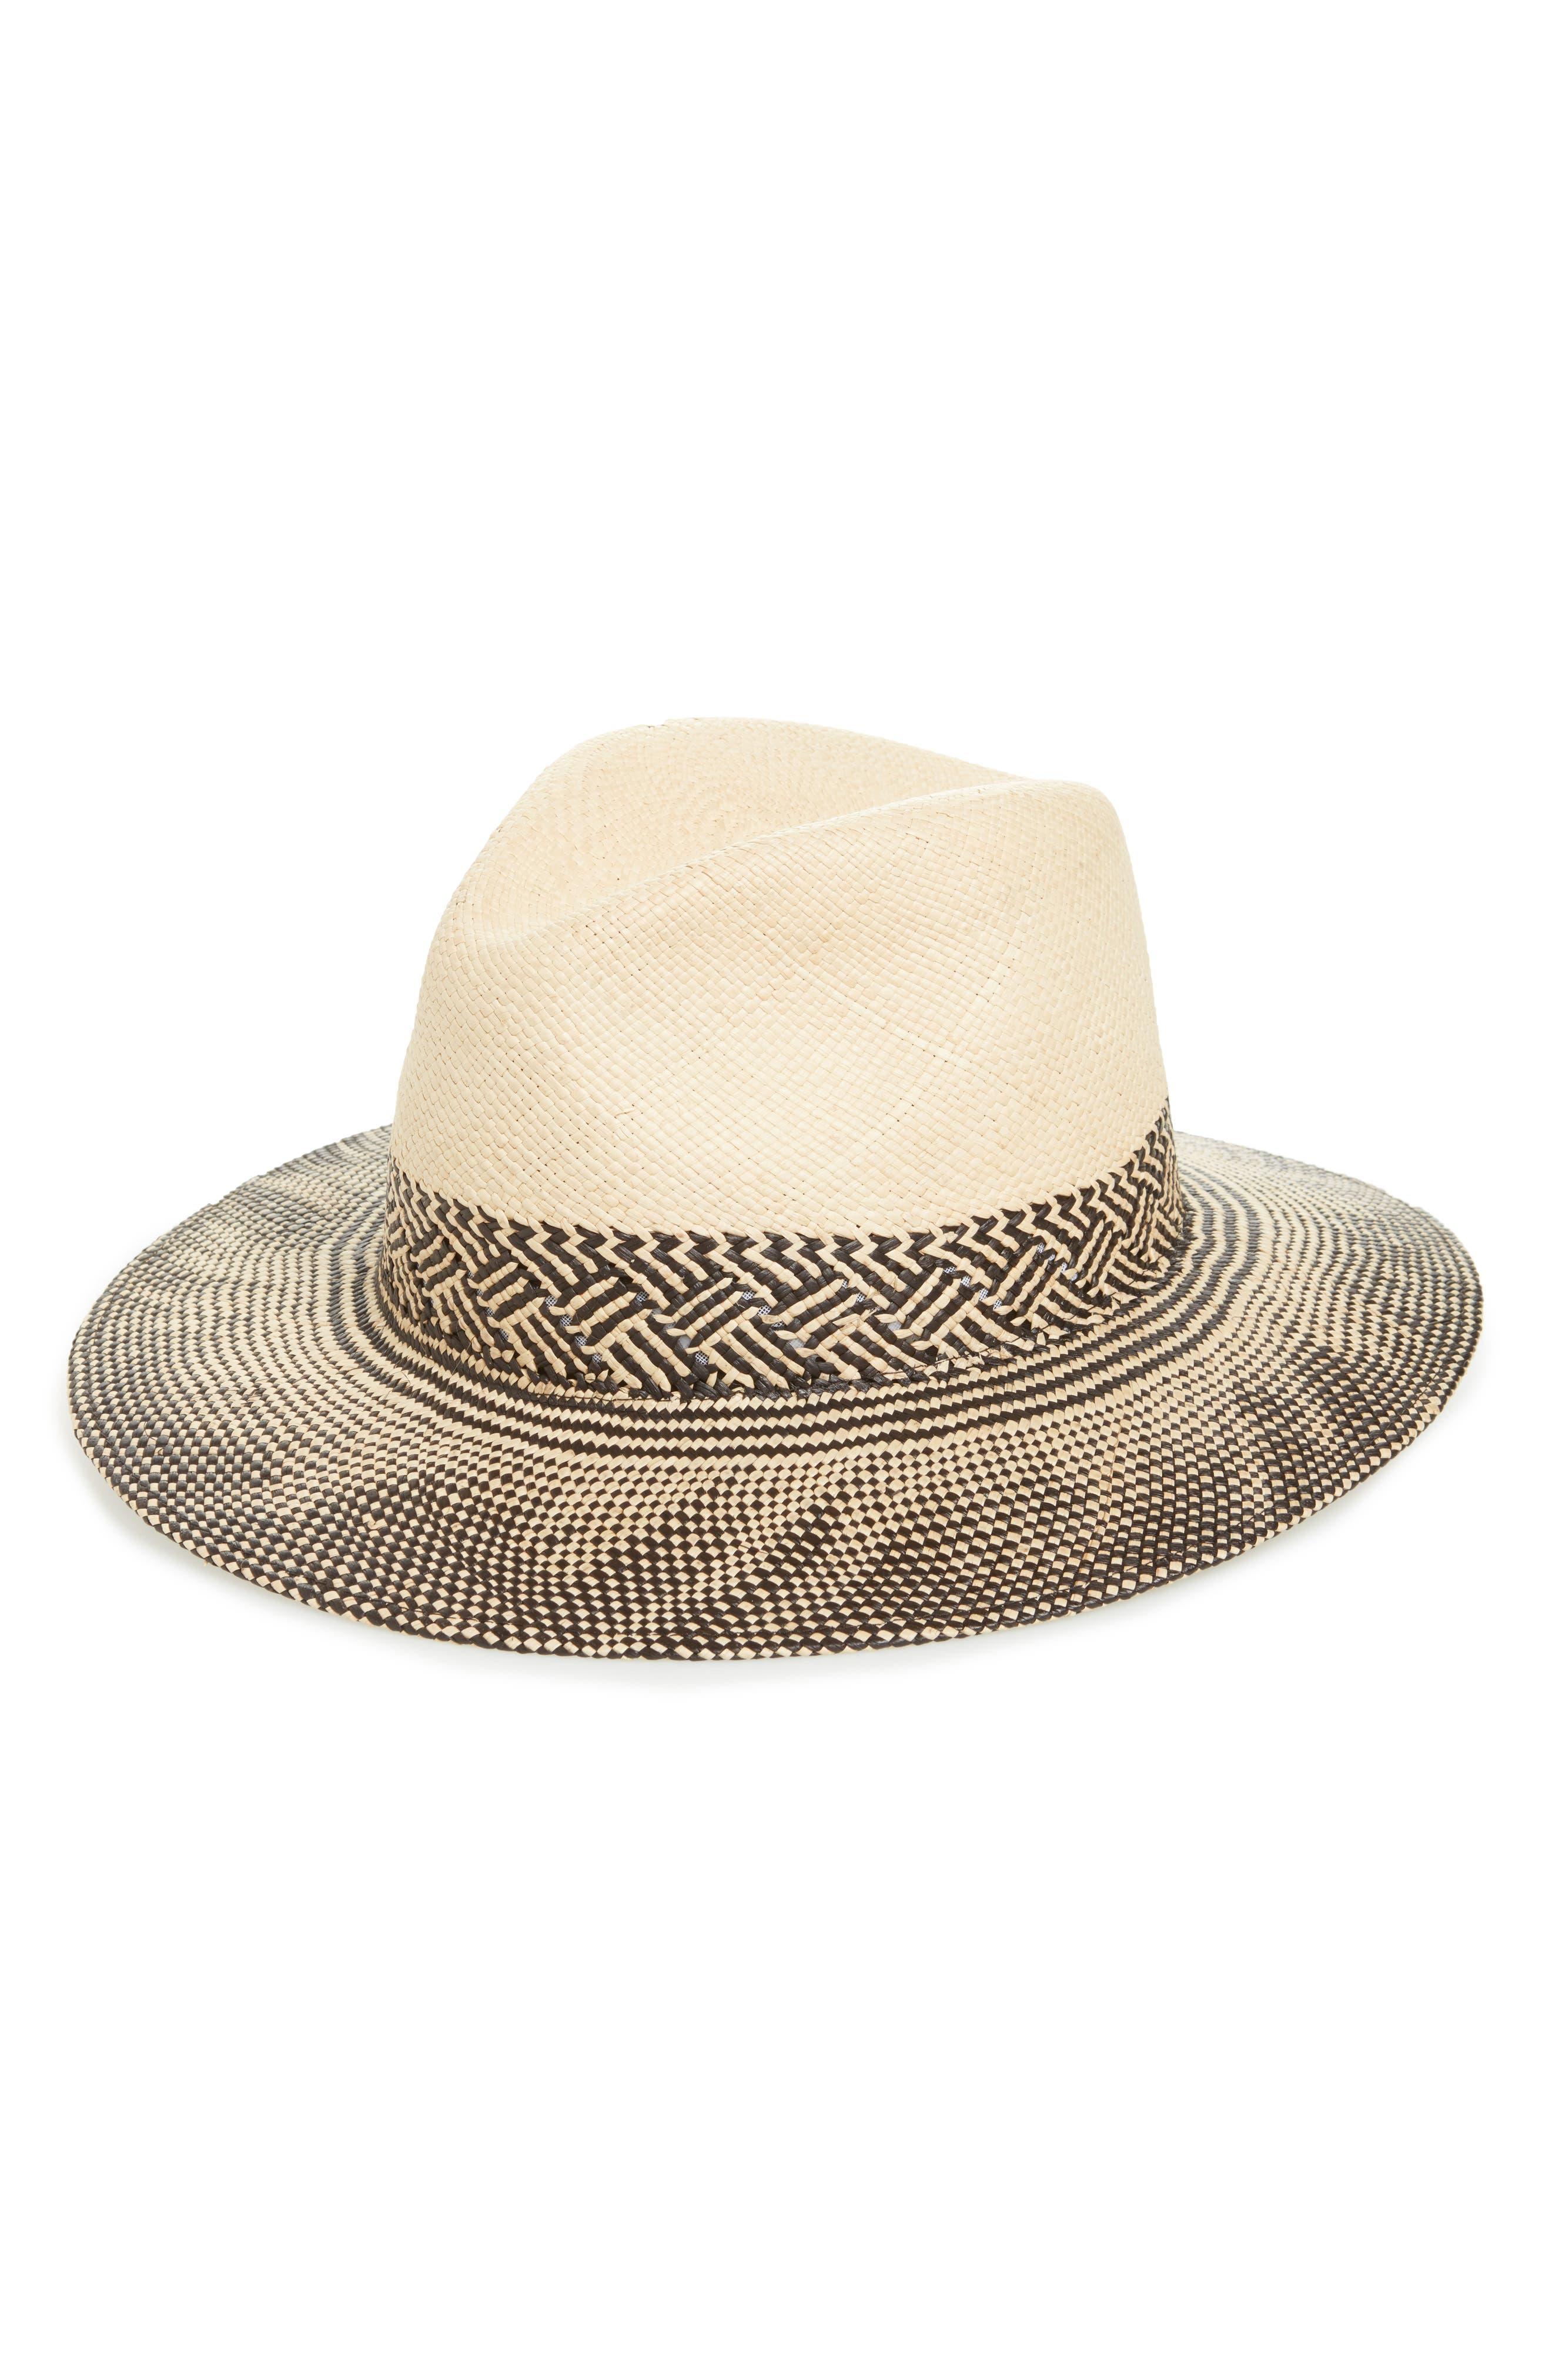 Straw Panama Hat,                         Main,                         color, 290